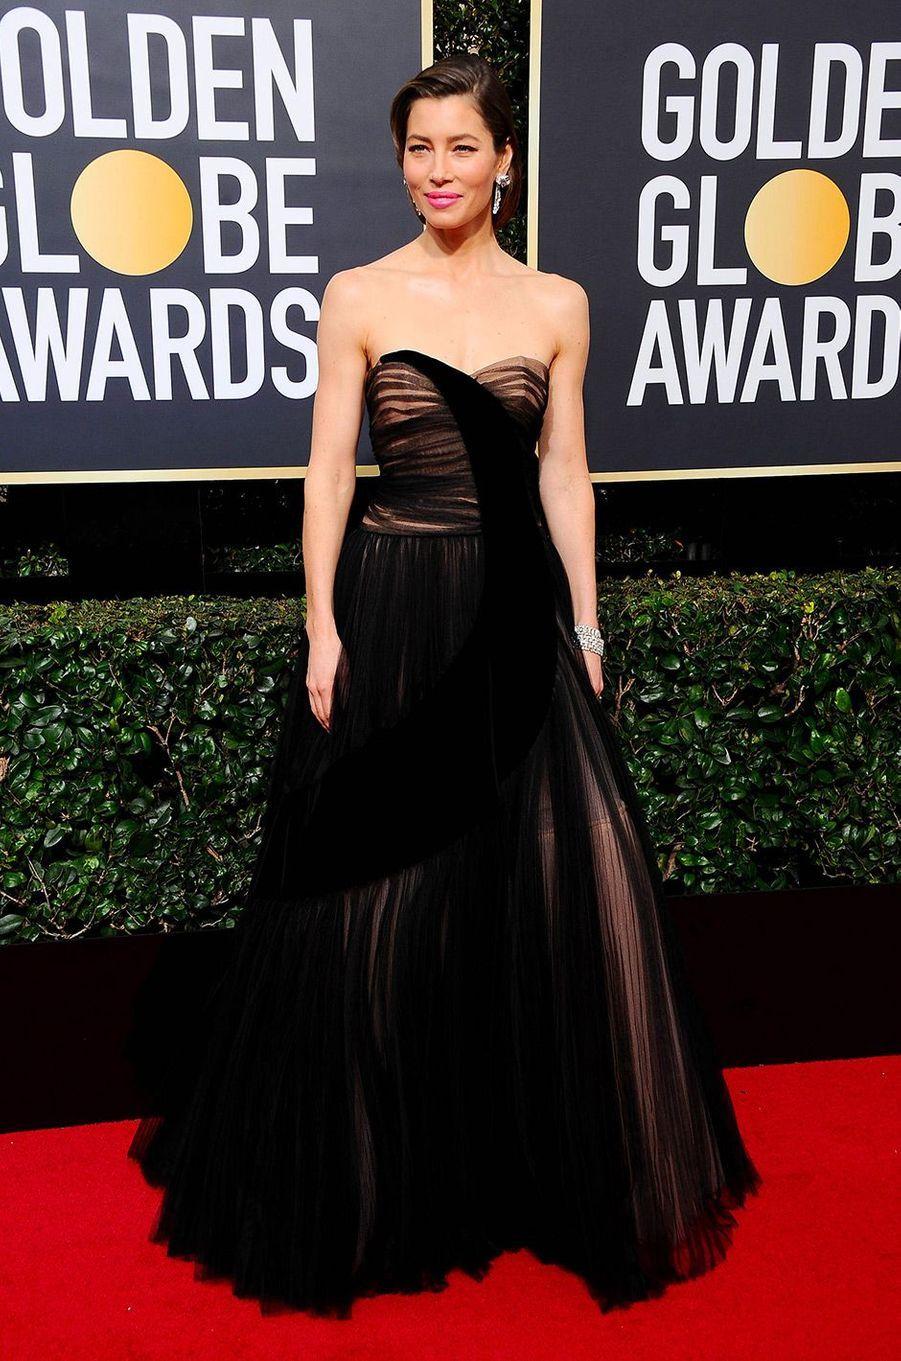 Jessica Biel dans une robe Dior aux Golden Globes 2018